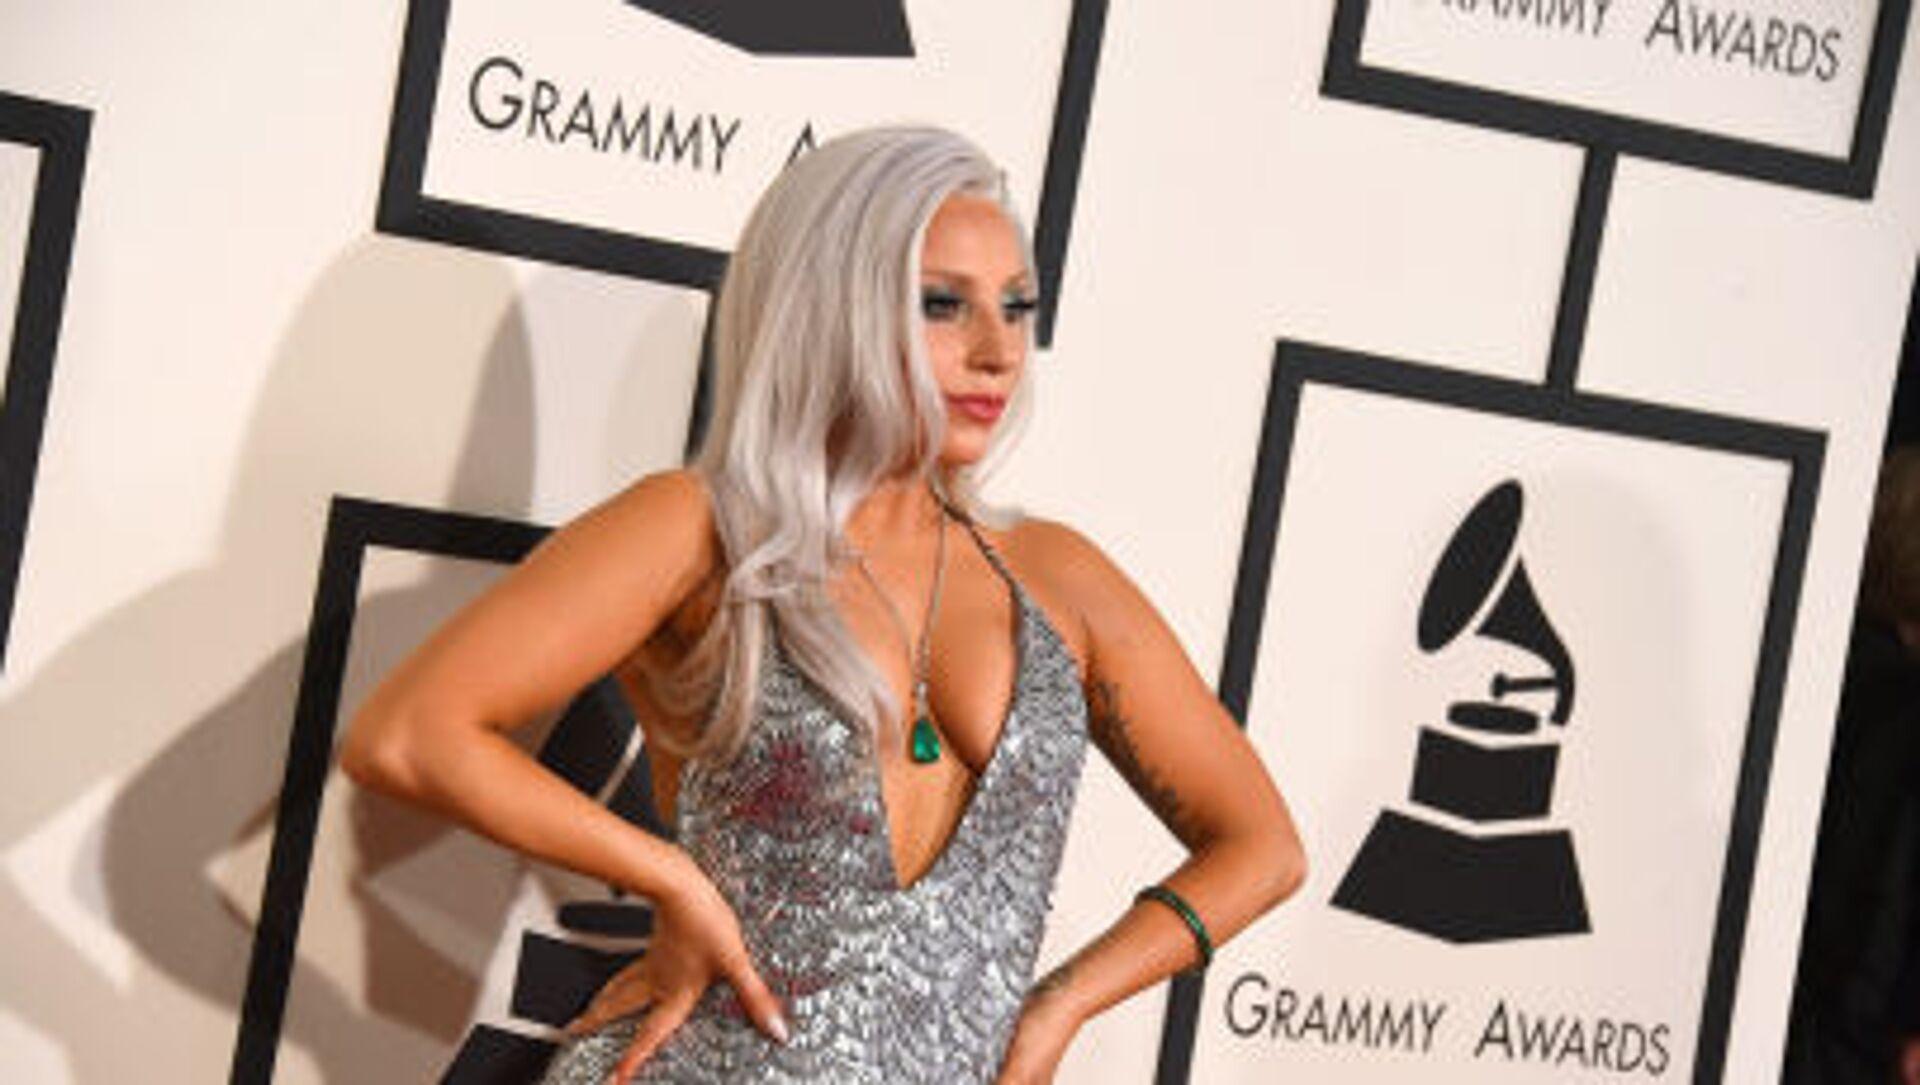 La cantante americana Lady Gaga - Sputnik Italia, 1920, 28.02.2021